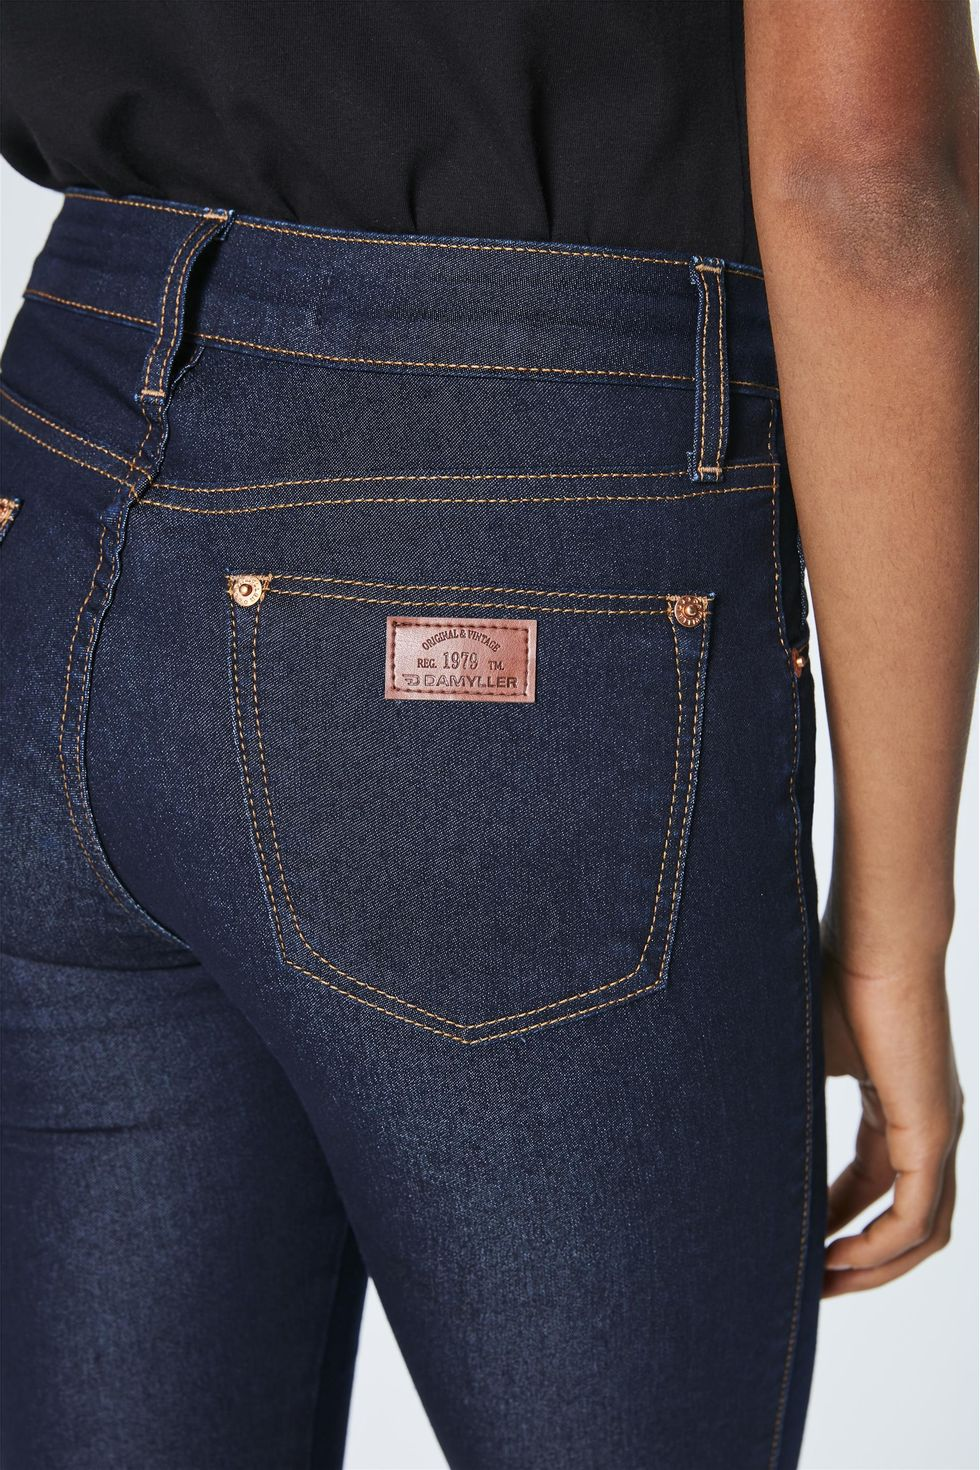 Calca-Jeans-Escuro-Jegging-Cropped-Frente--